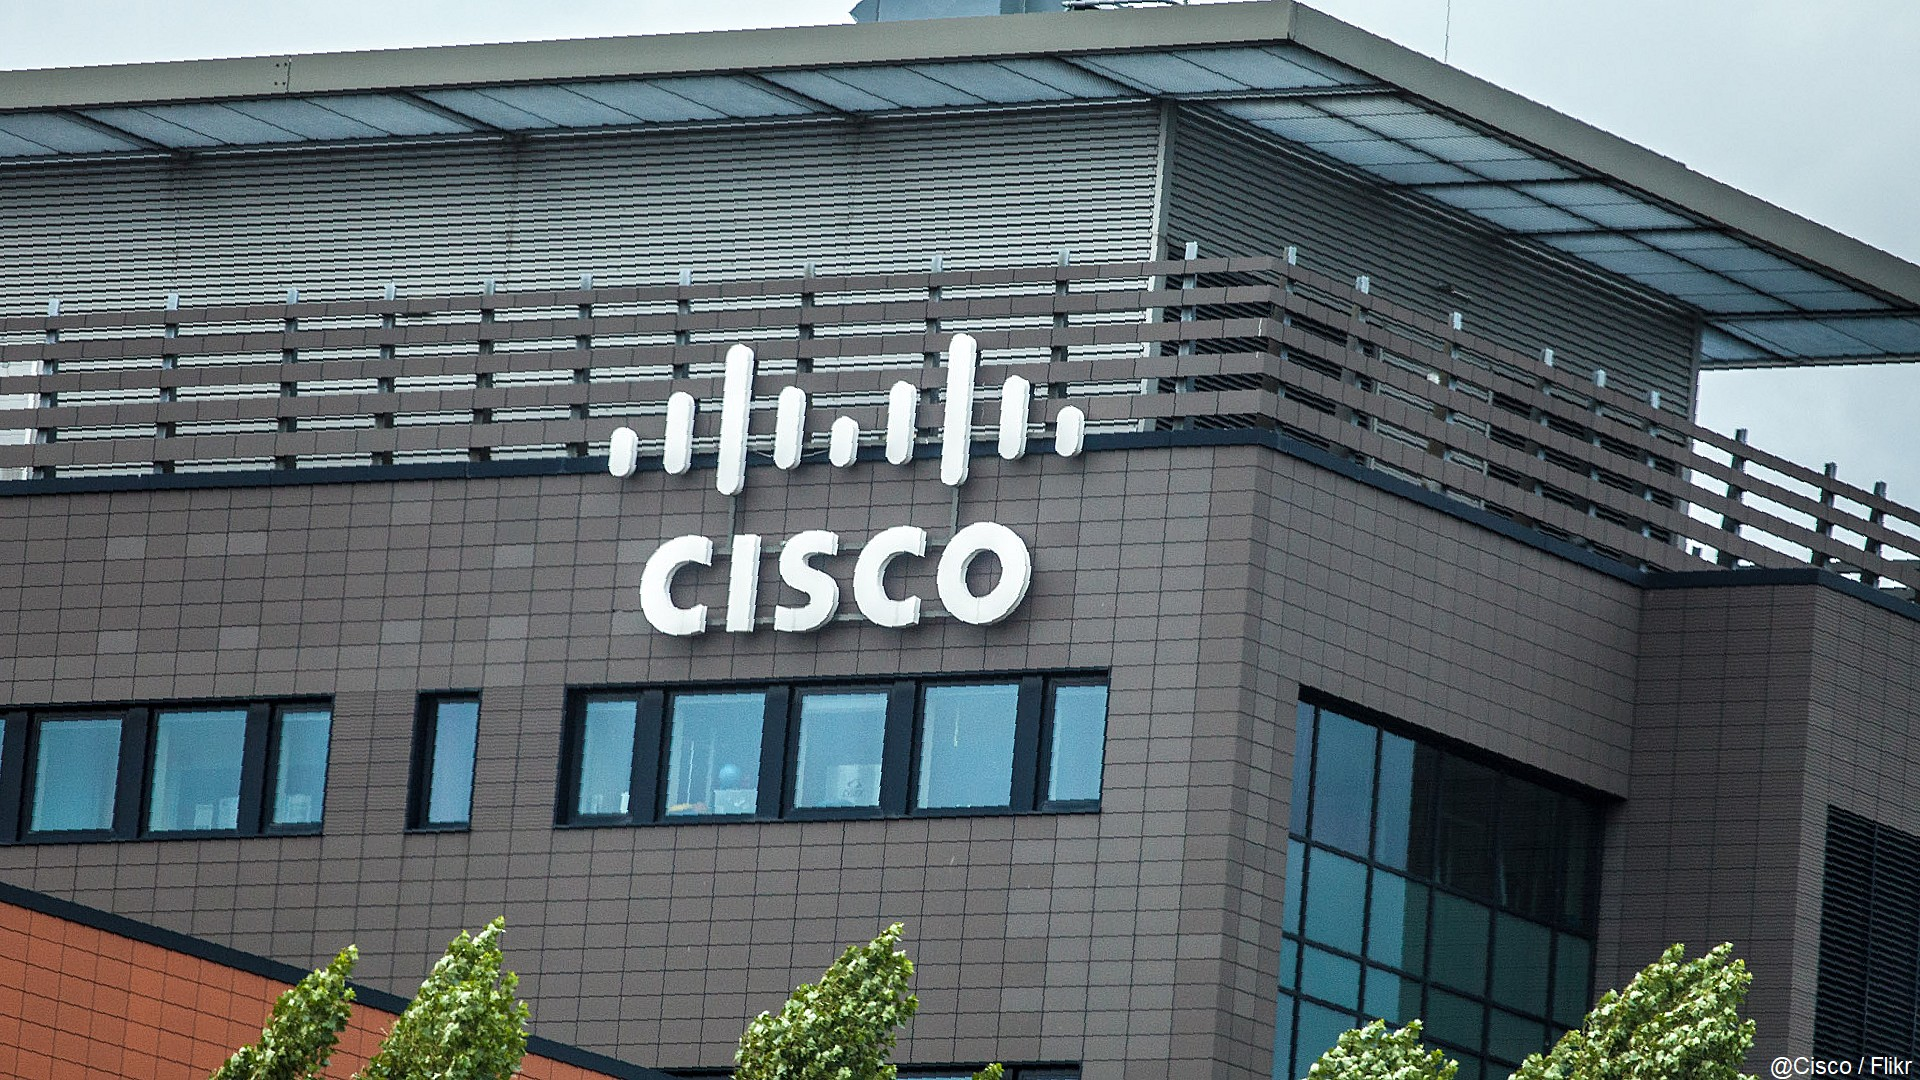 Cisco x logo (batiment)